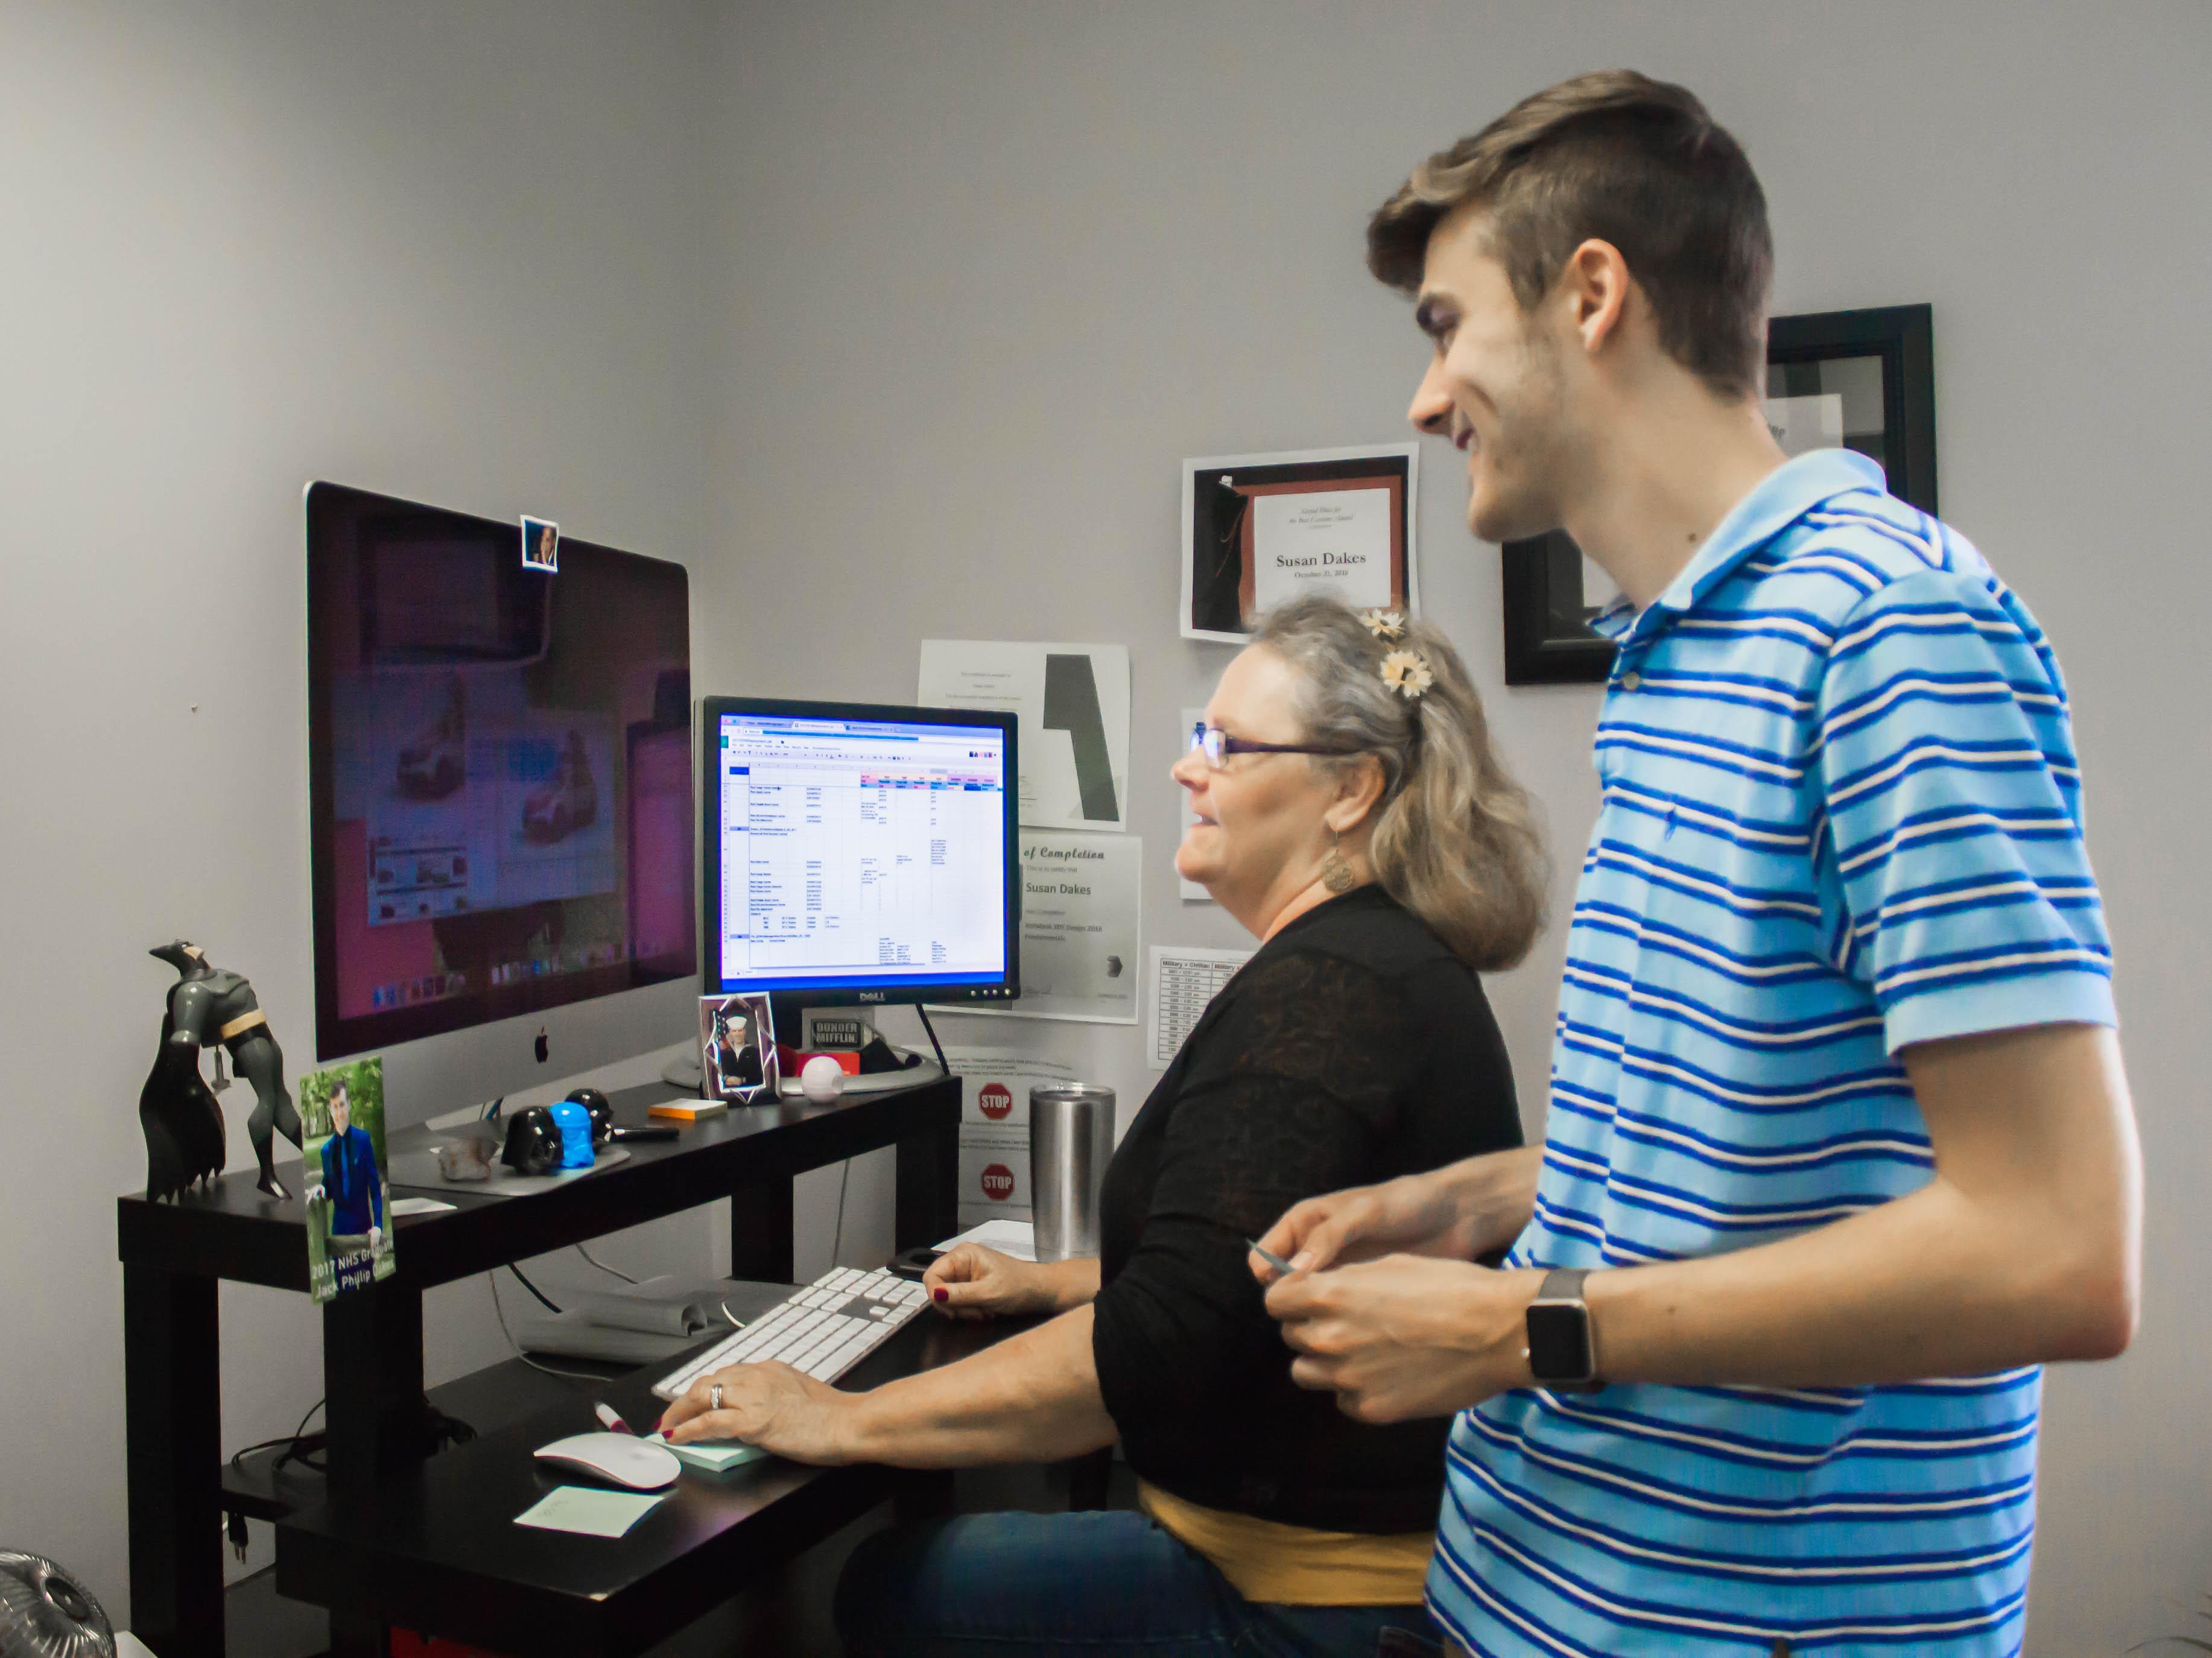 Graphics team working on configurators